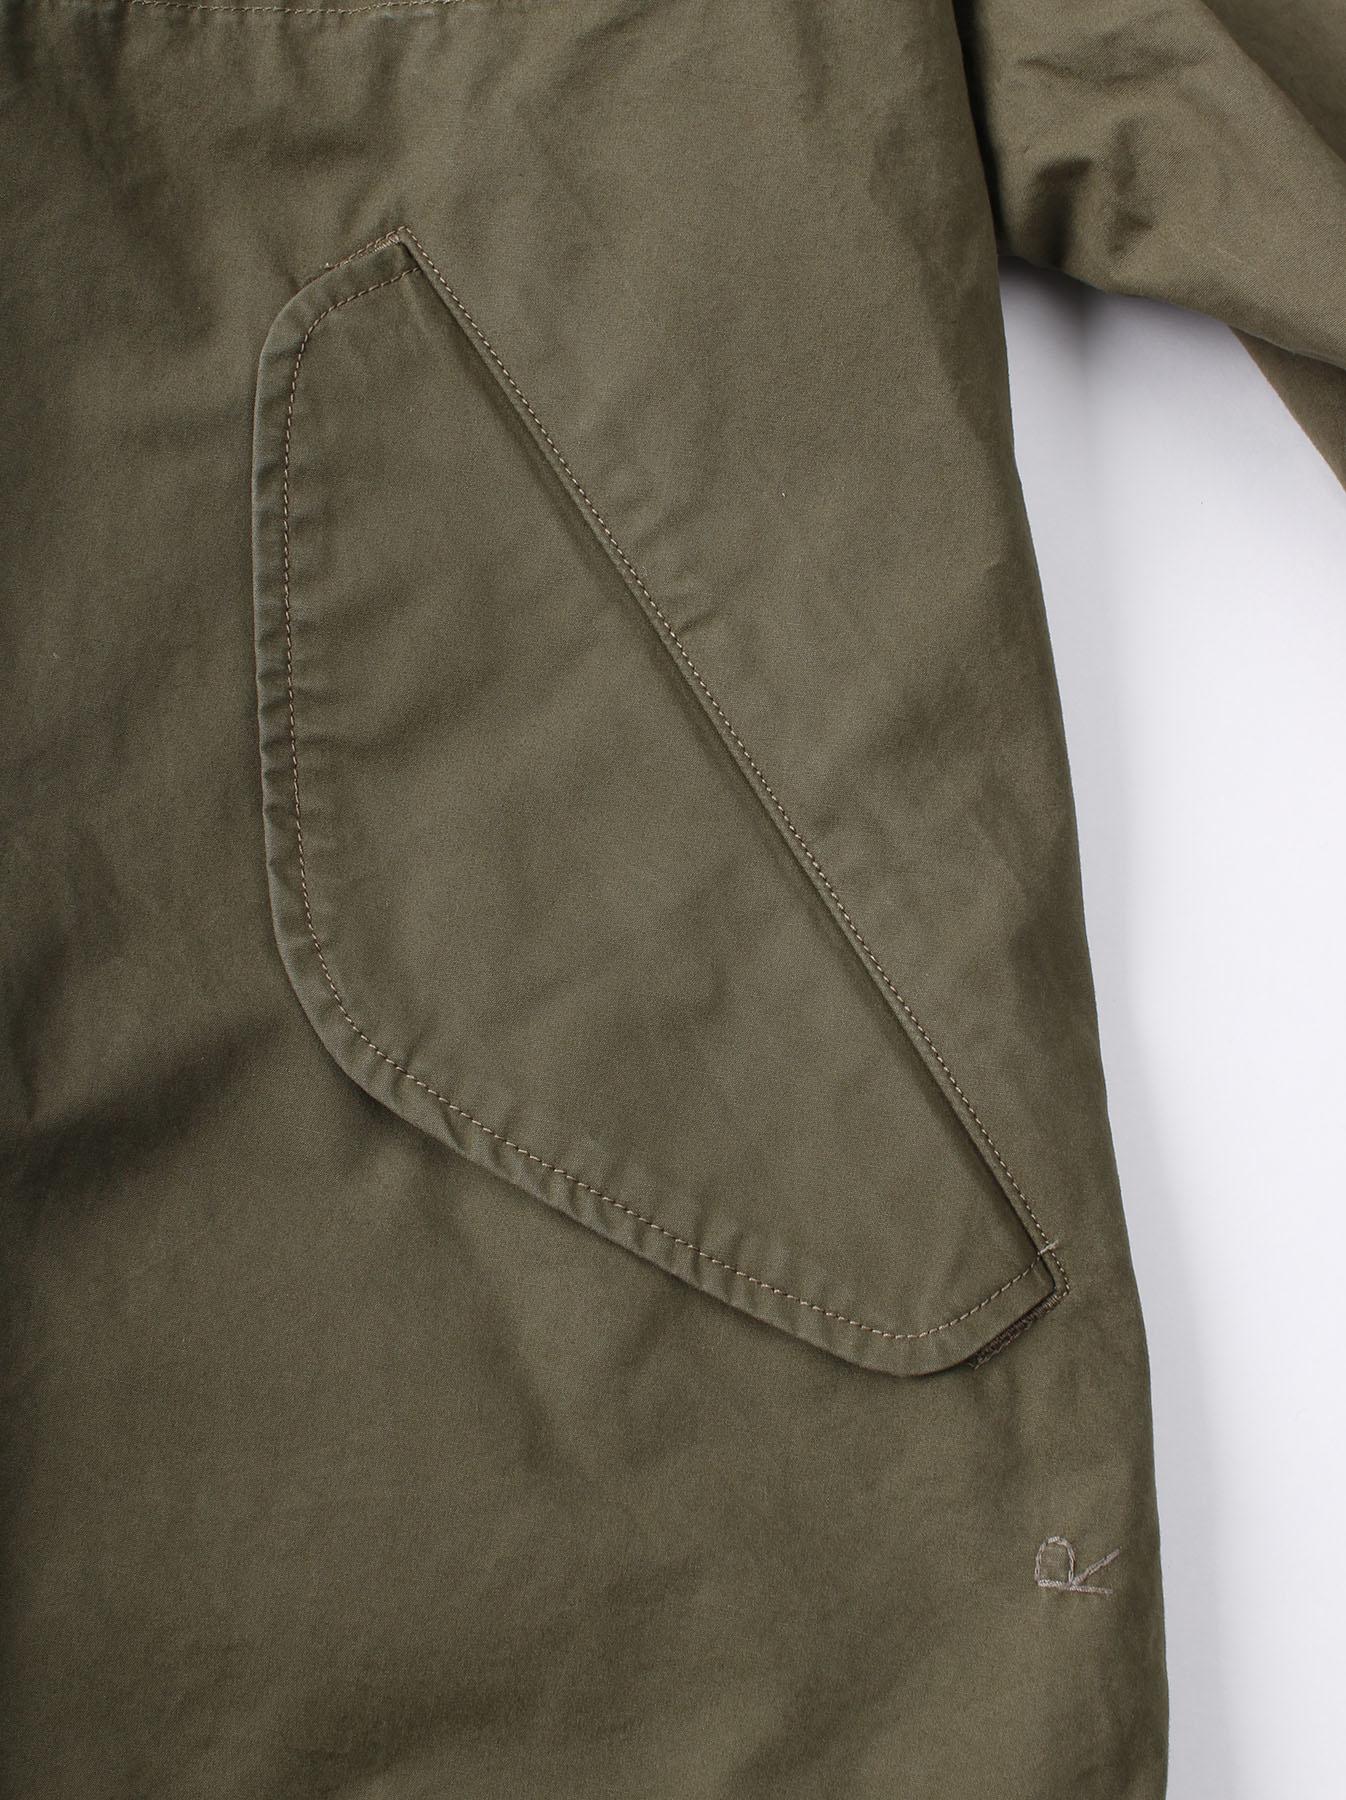 Weather Cloth Umahiko Mods Hoodie-10